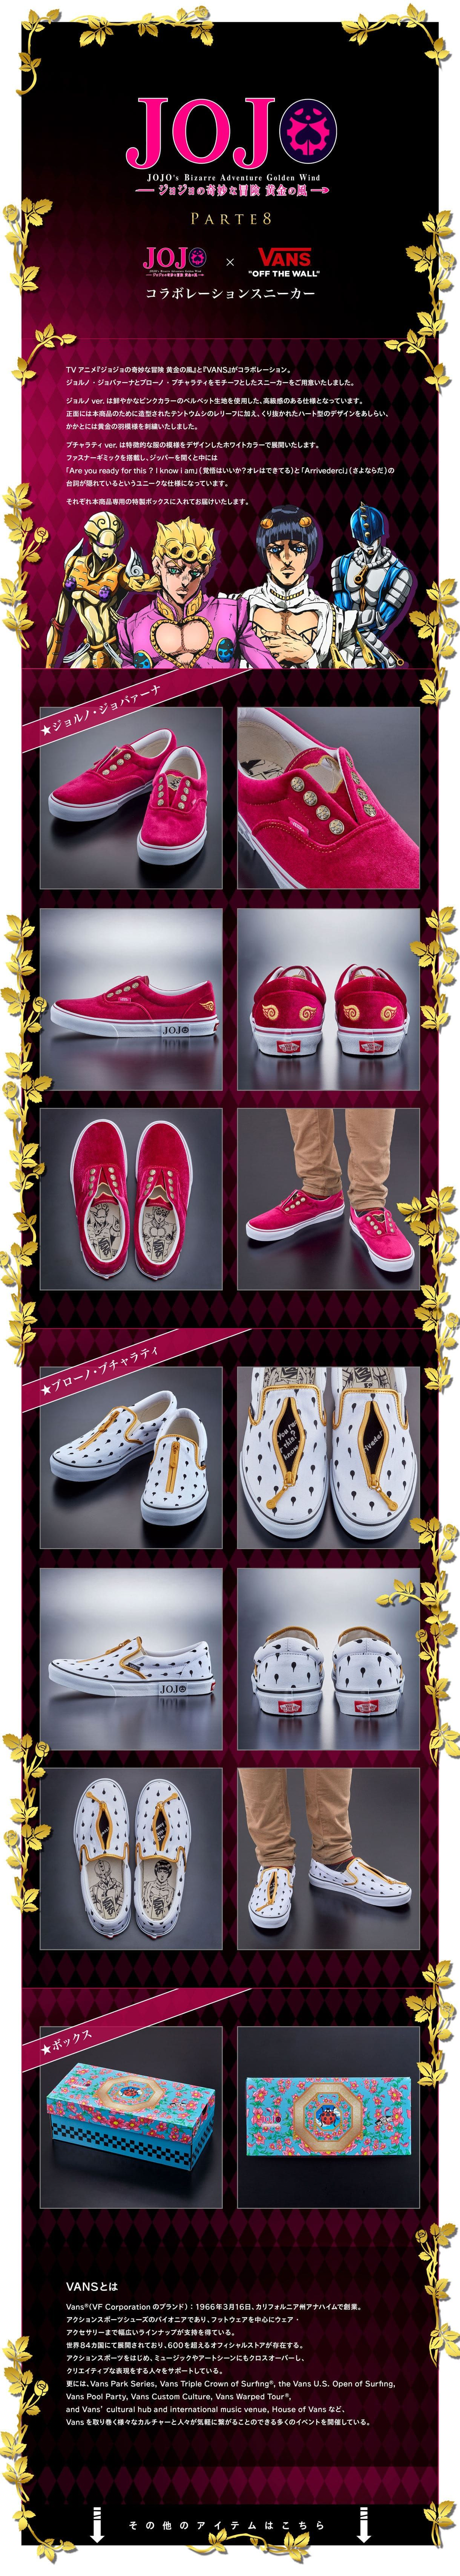 《JoJo的奇妙冒險 第五部 黃金之風》X VANS 「喬魯諾/布加拉提 風格休閒鞋」!【ジョジョの奇妙な冒険 黄金の風×VANS】コラボレーションスニーカー